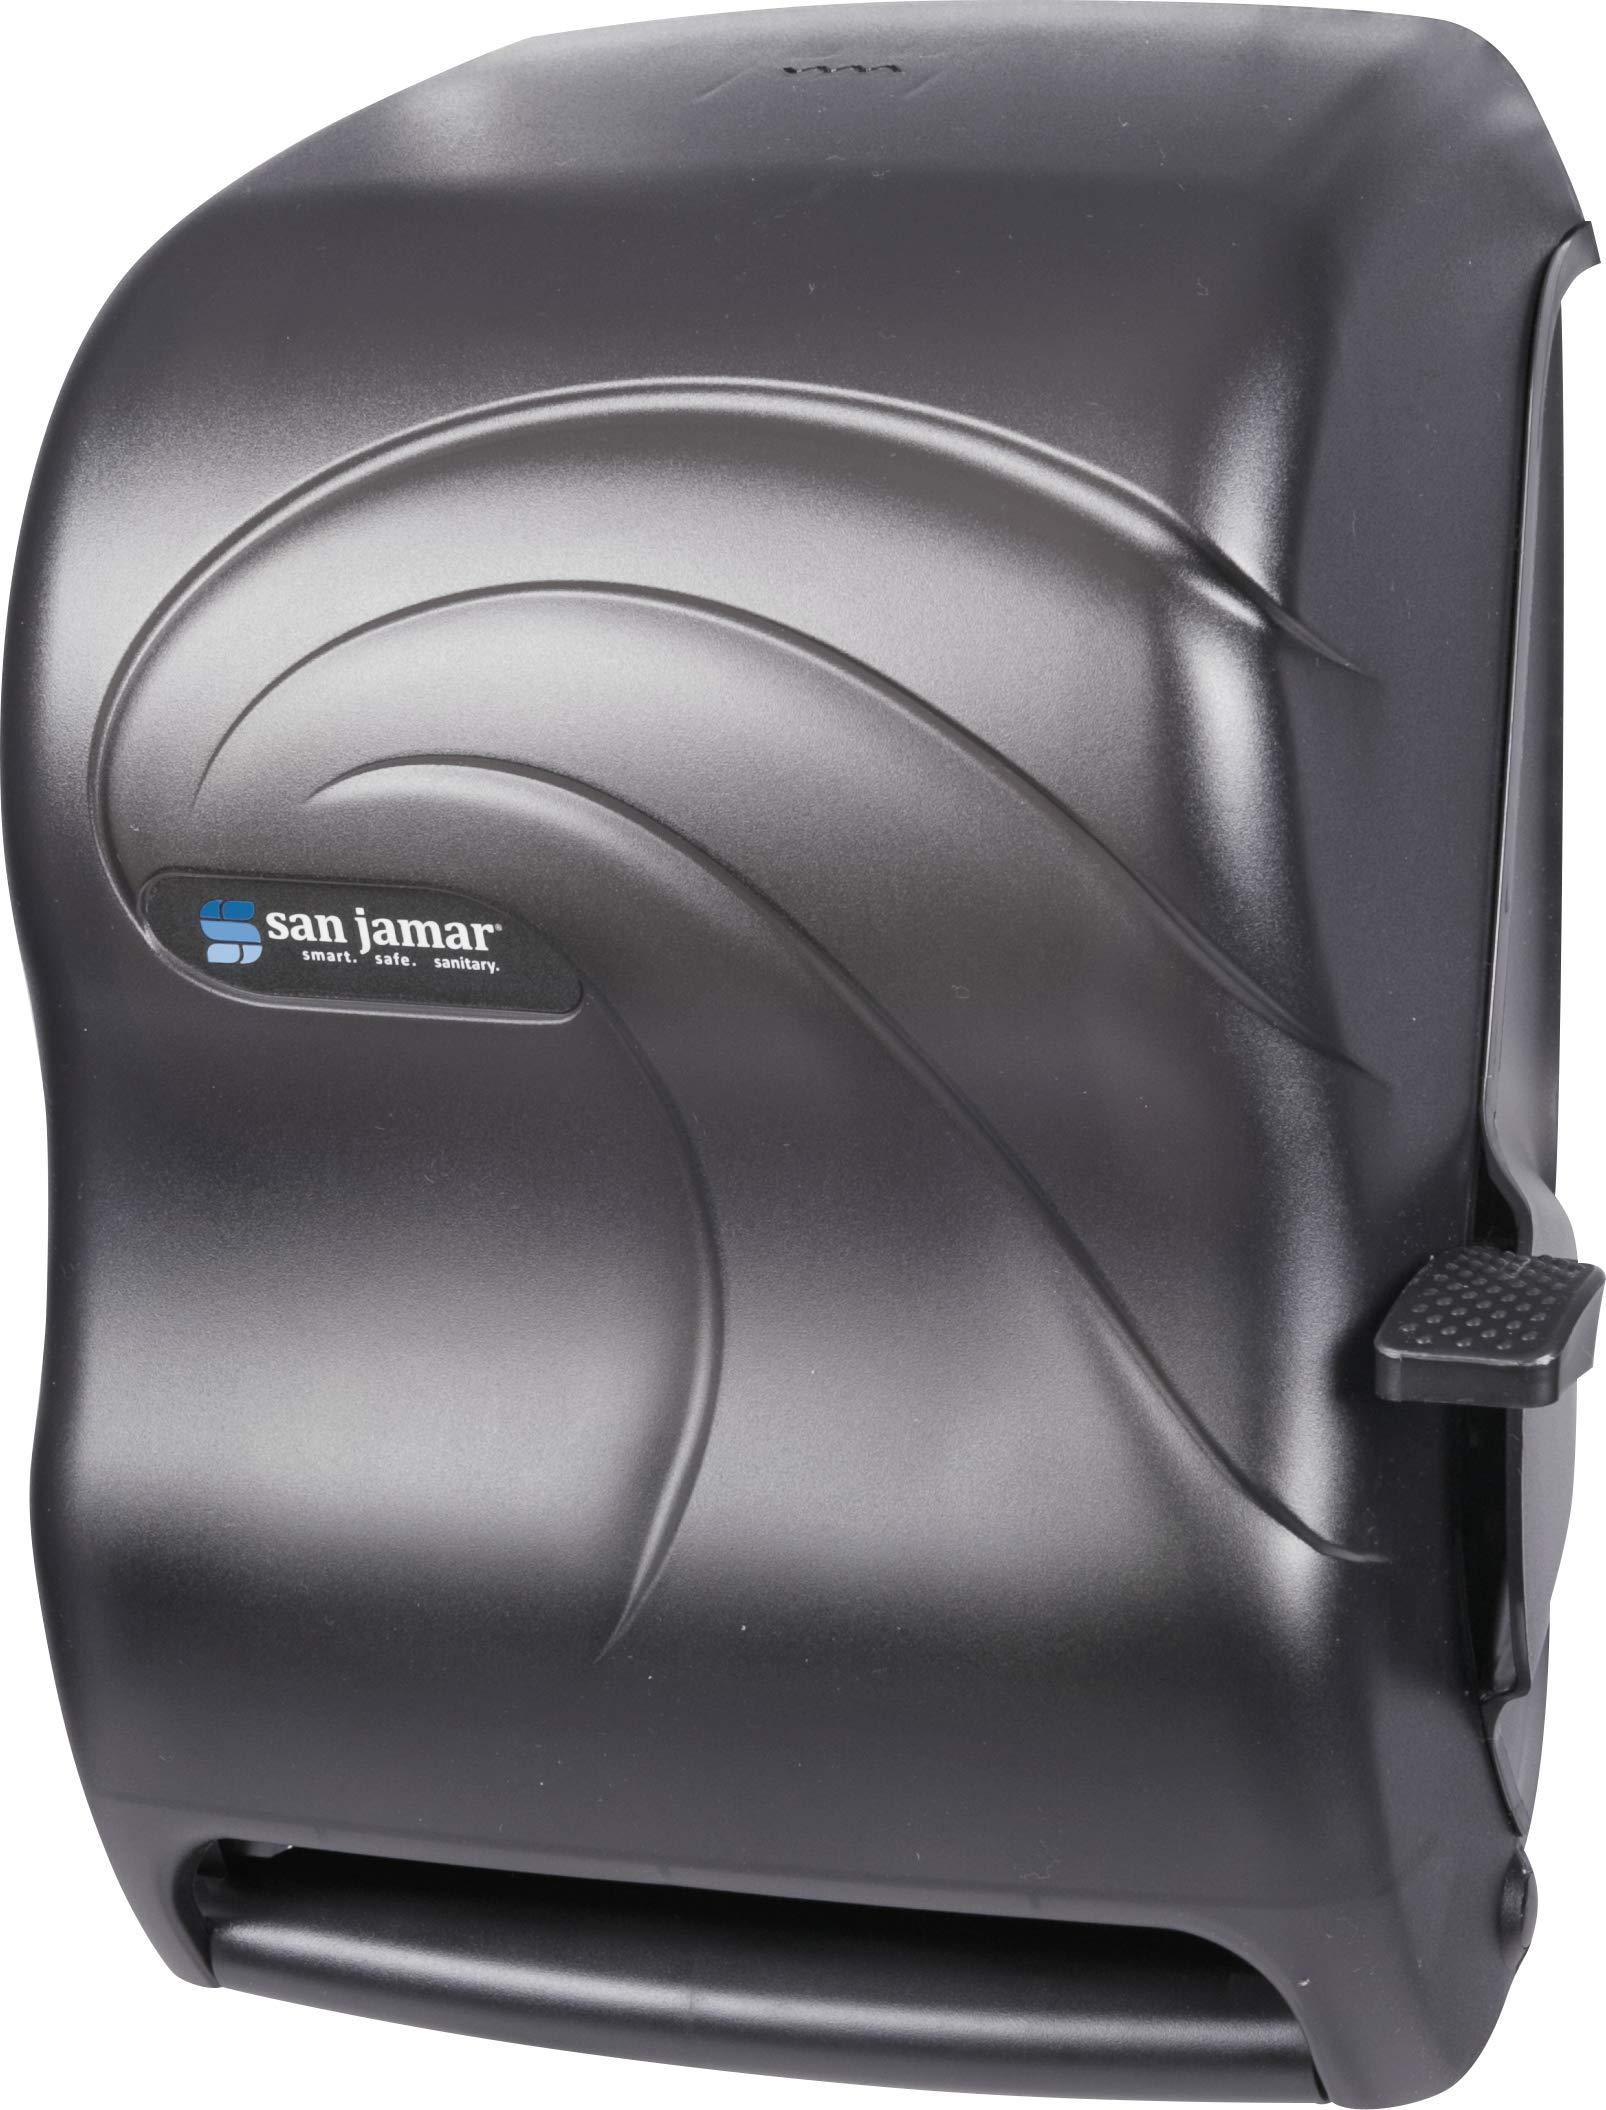 San Jamar T1190TBK Lever Roll Towel Dispenser, Oceans, Black Pearl, 12 15/16w x 9 1/4d x 16 1/2h